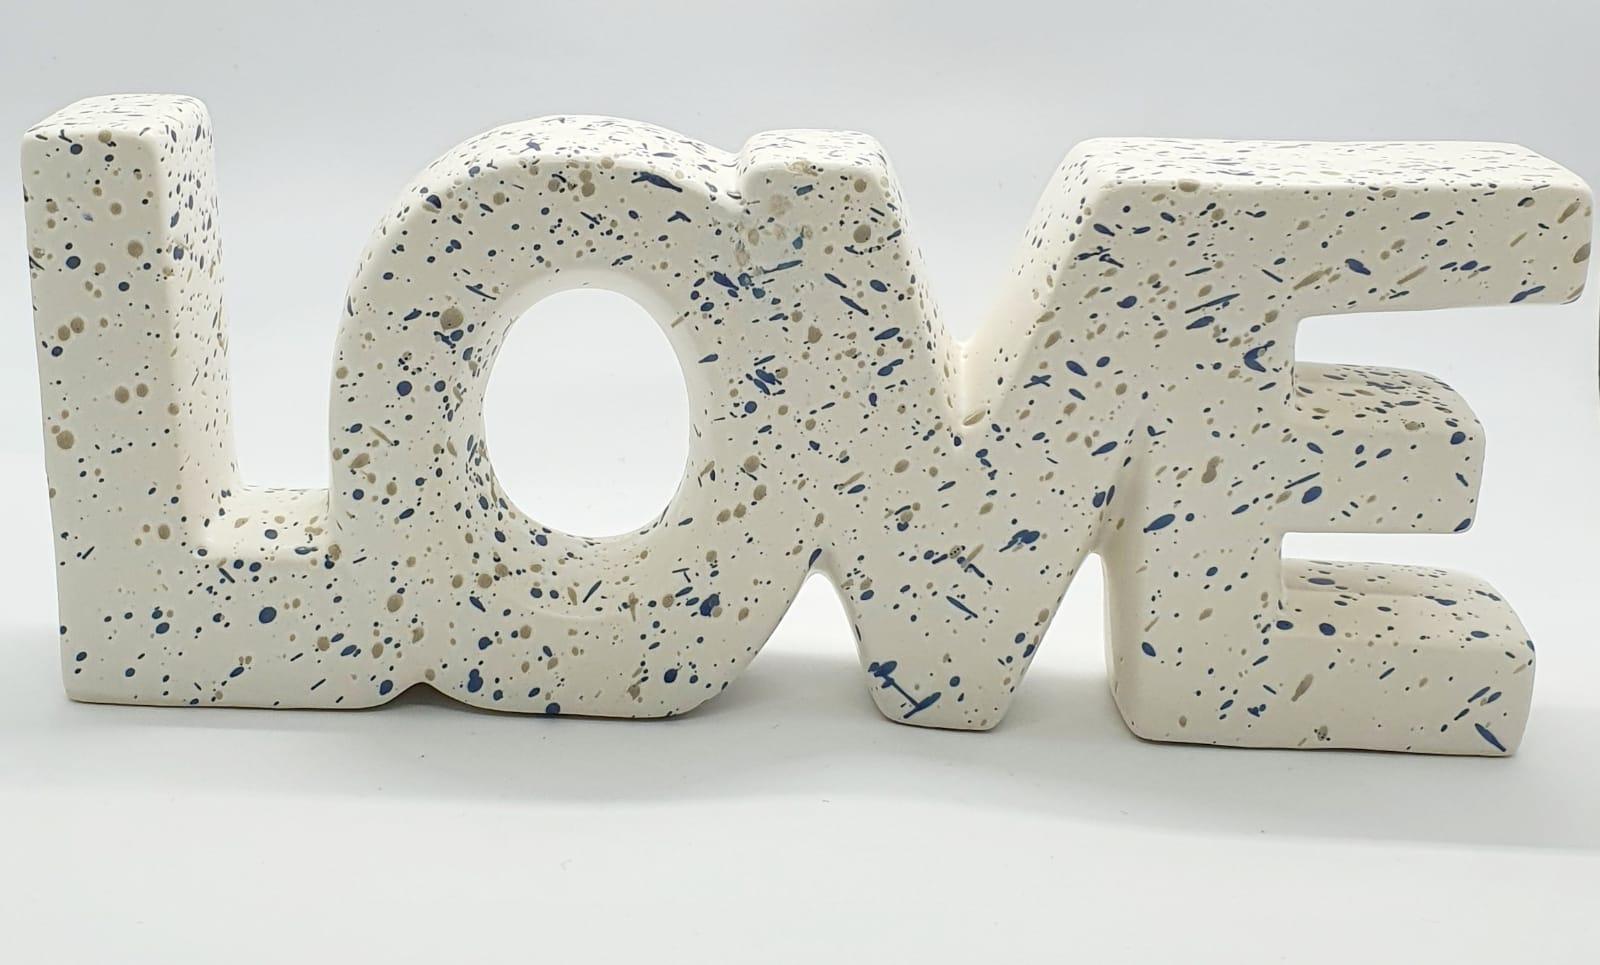 Love branco em cerâmica